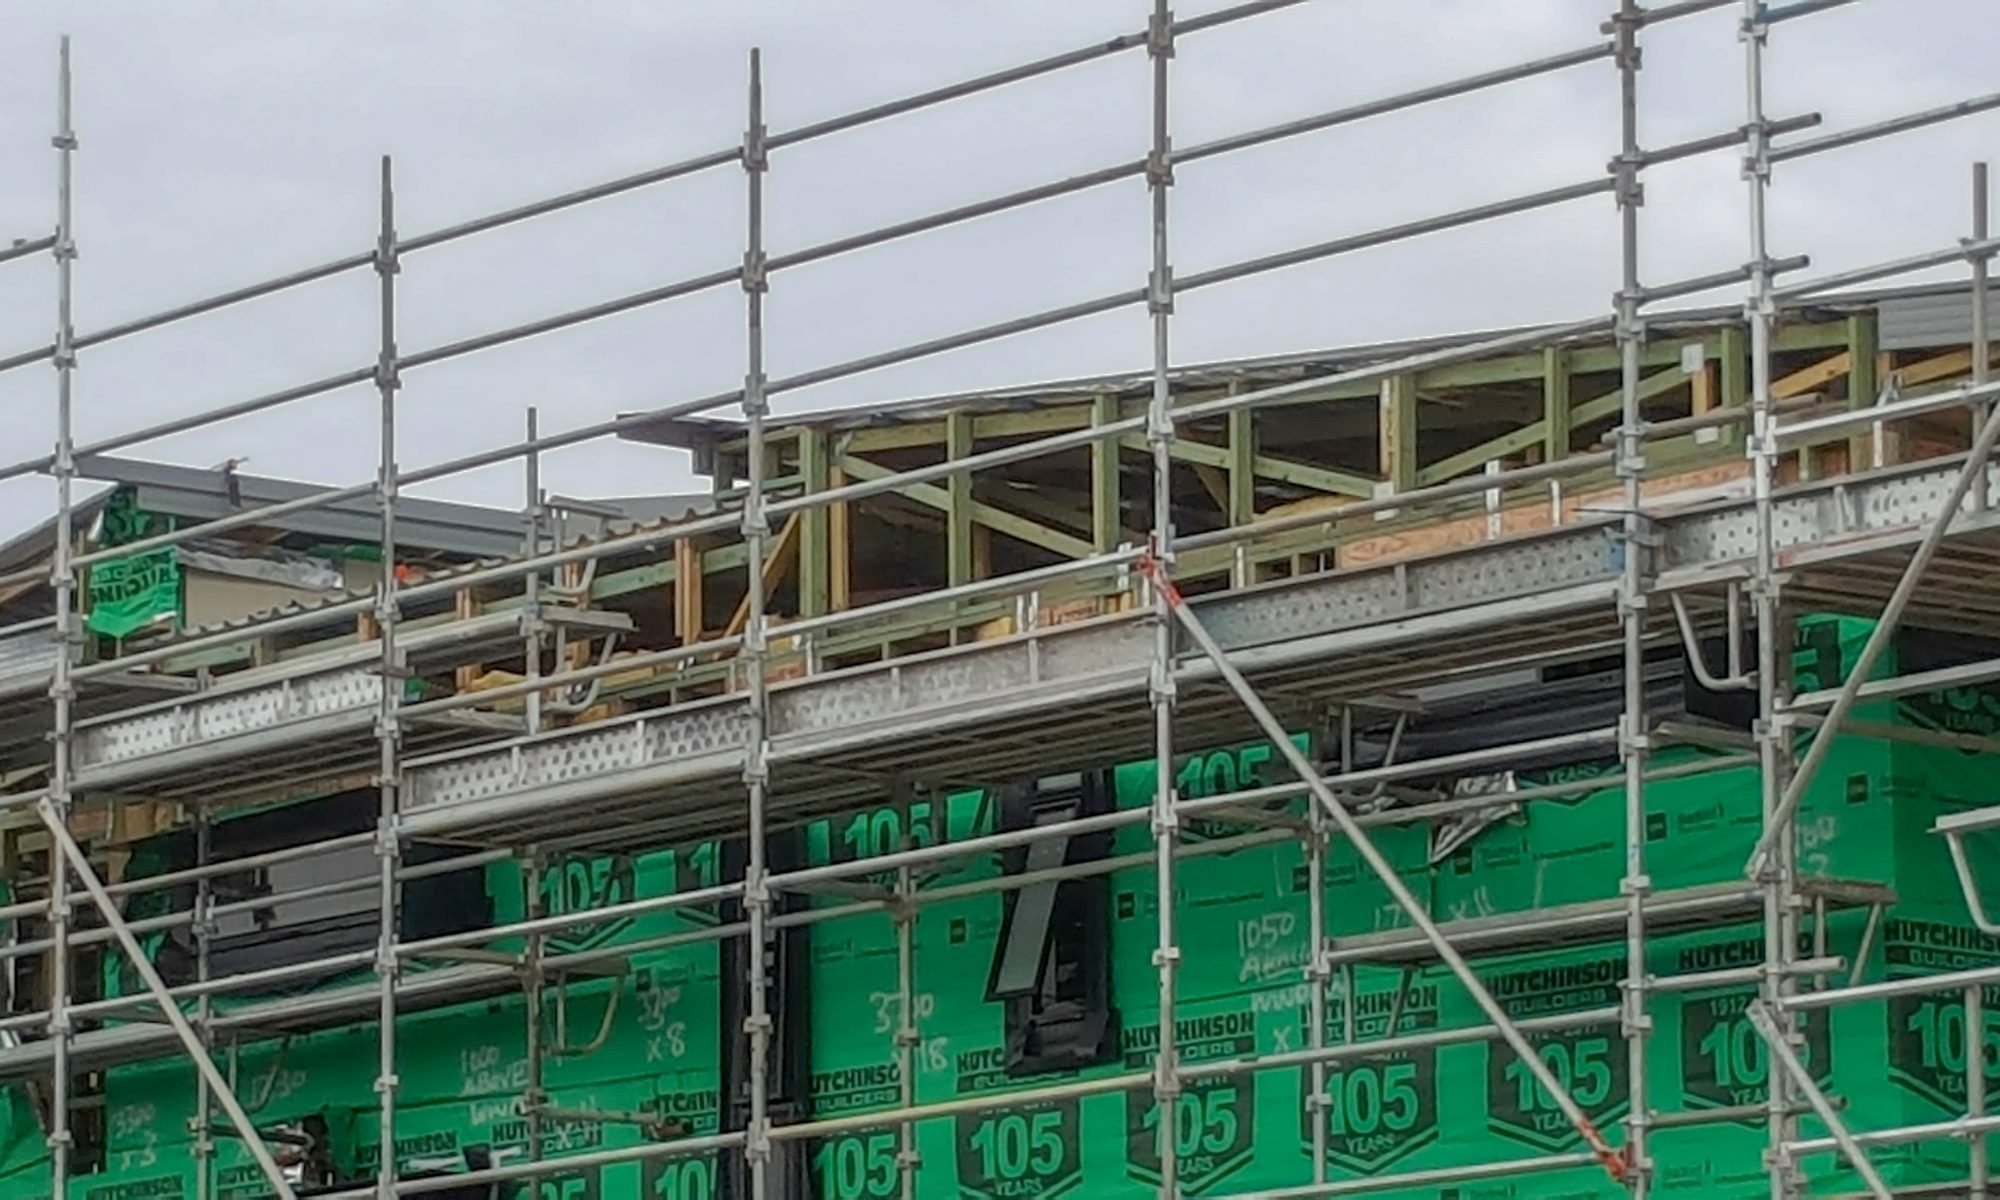 Precision cranes article, scaffold, house frame